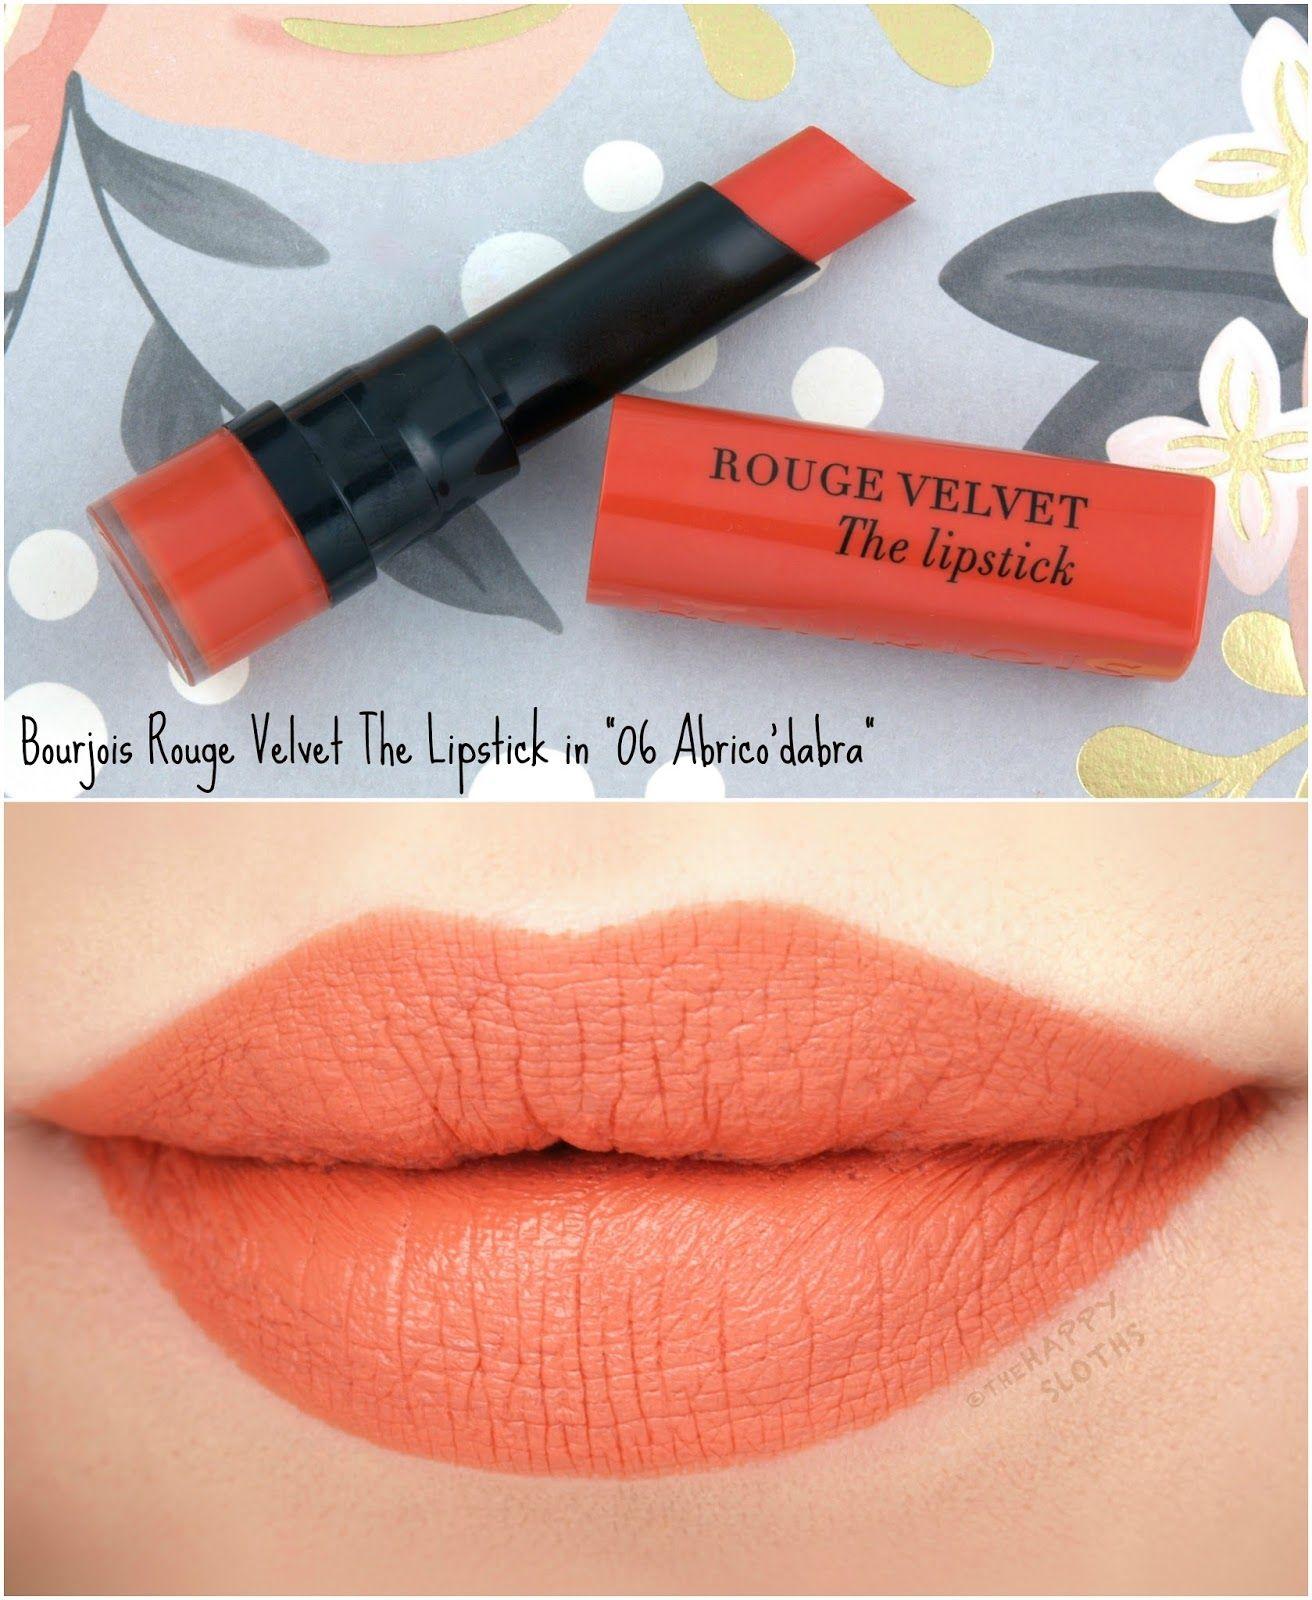 Bourjois Beauty Bourjois Rouge Velvet Lipstick Bourjois